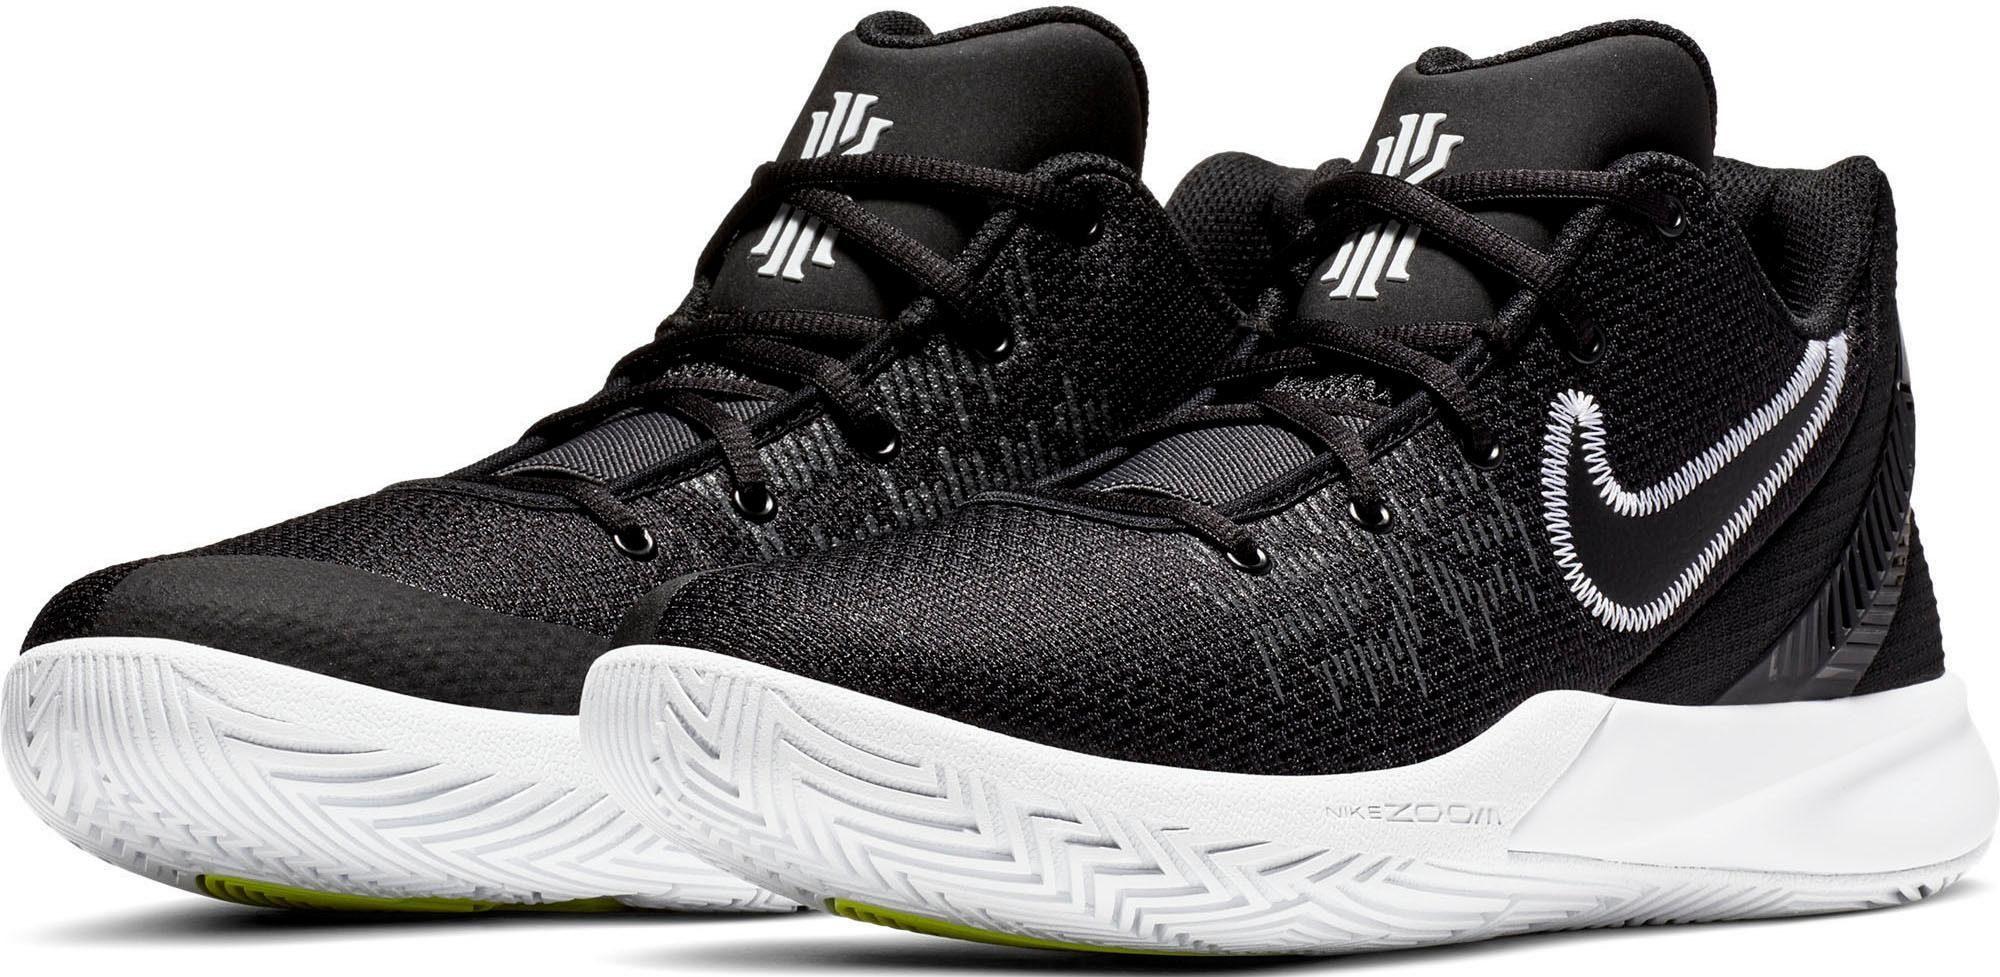 Nike »Kyrie Flytrap II« Basketballschuh, Atmungsaktives Obermaterial aus Textil und Synthetik online kaufen   OTTO